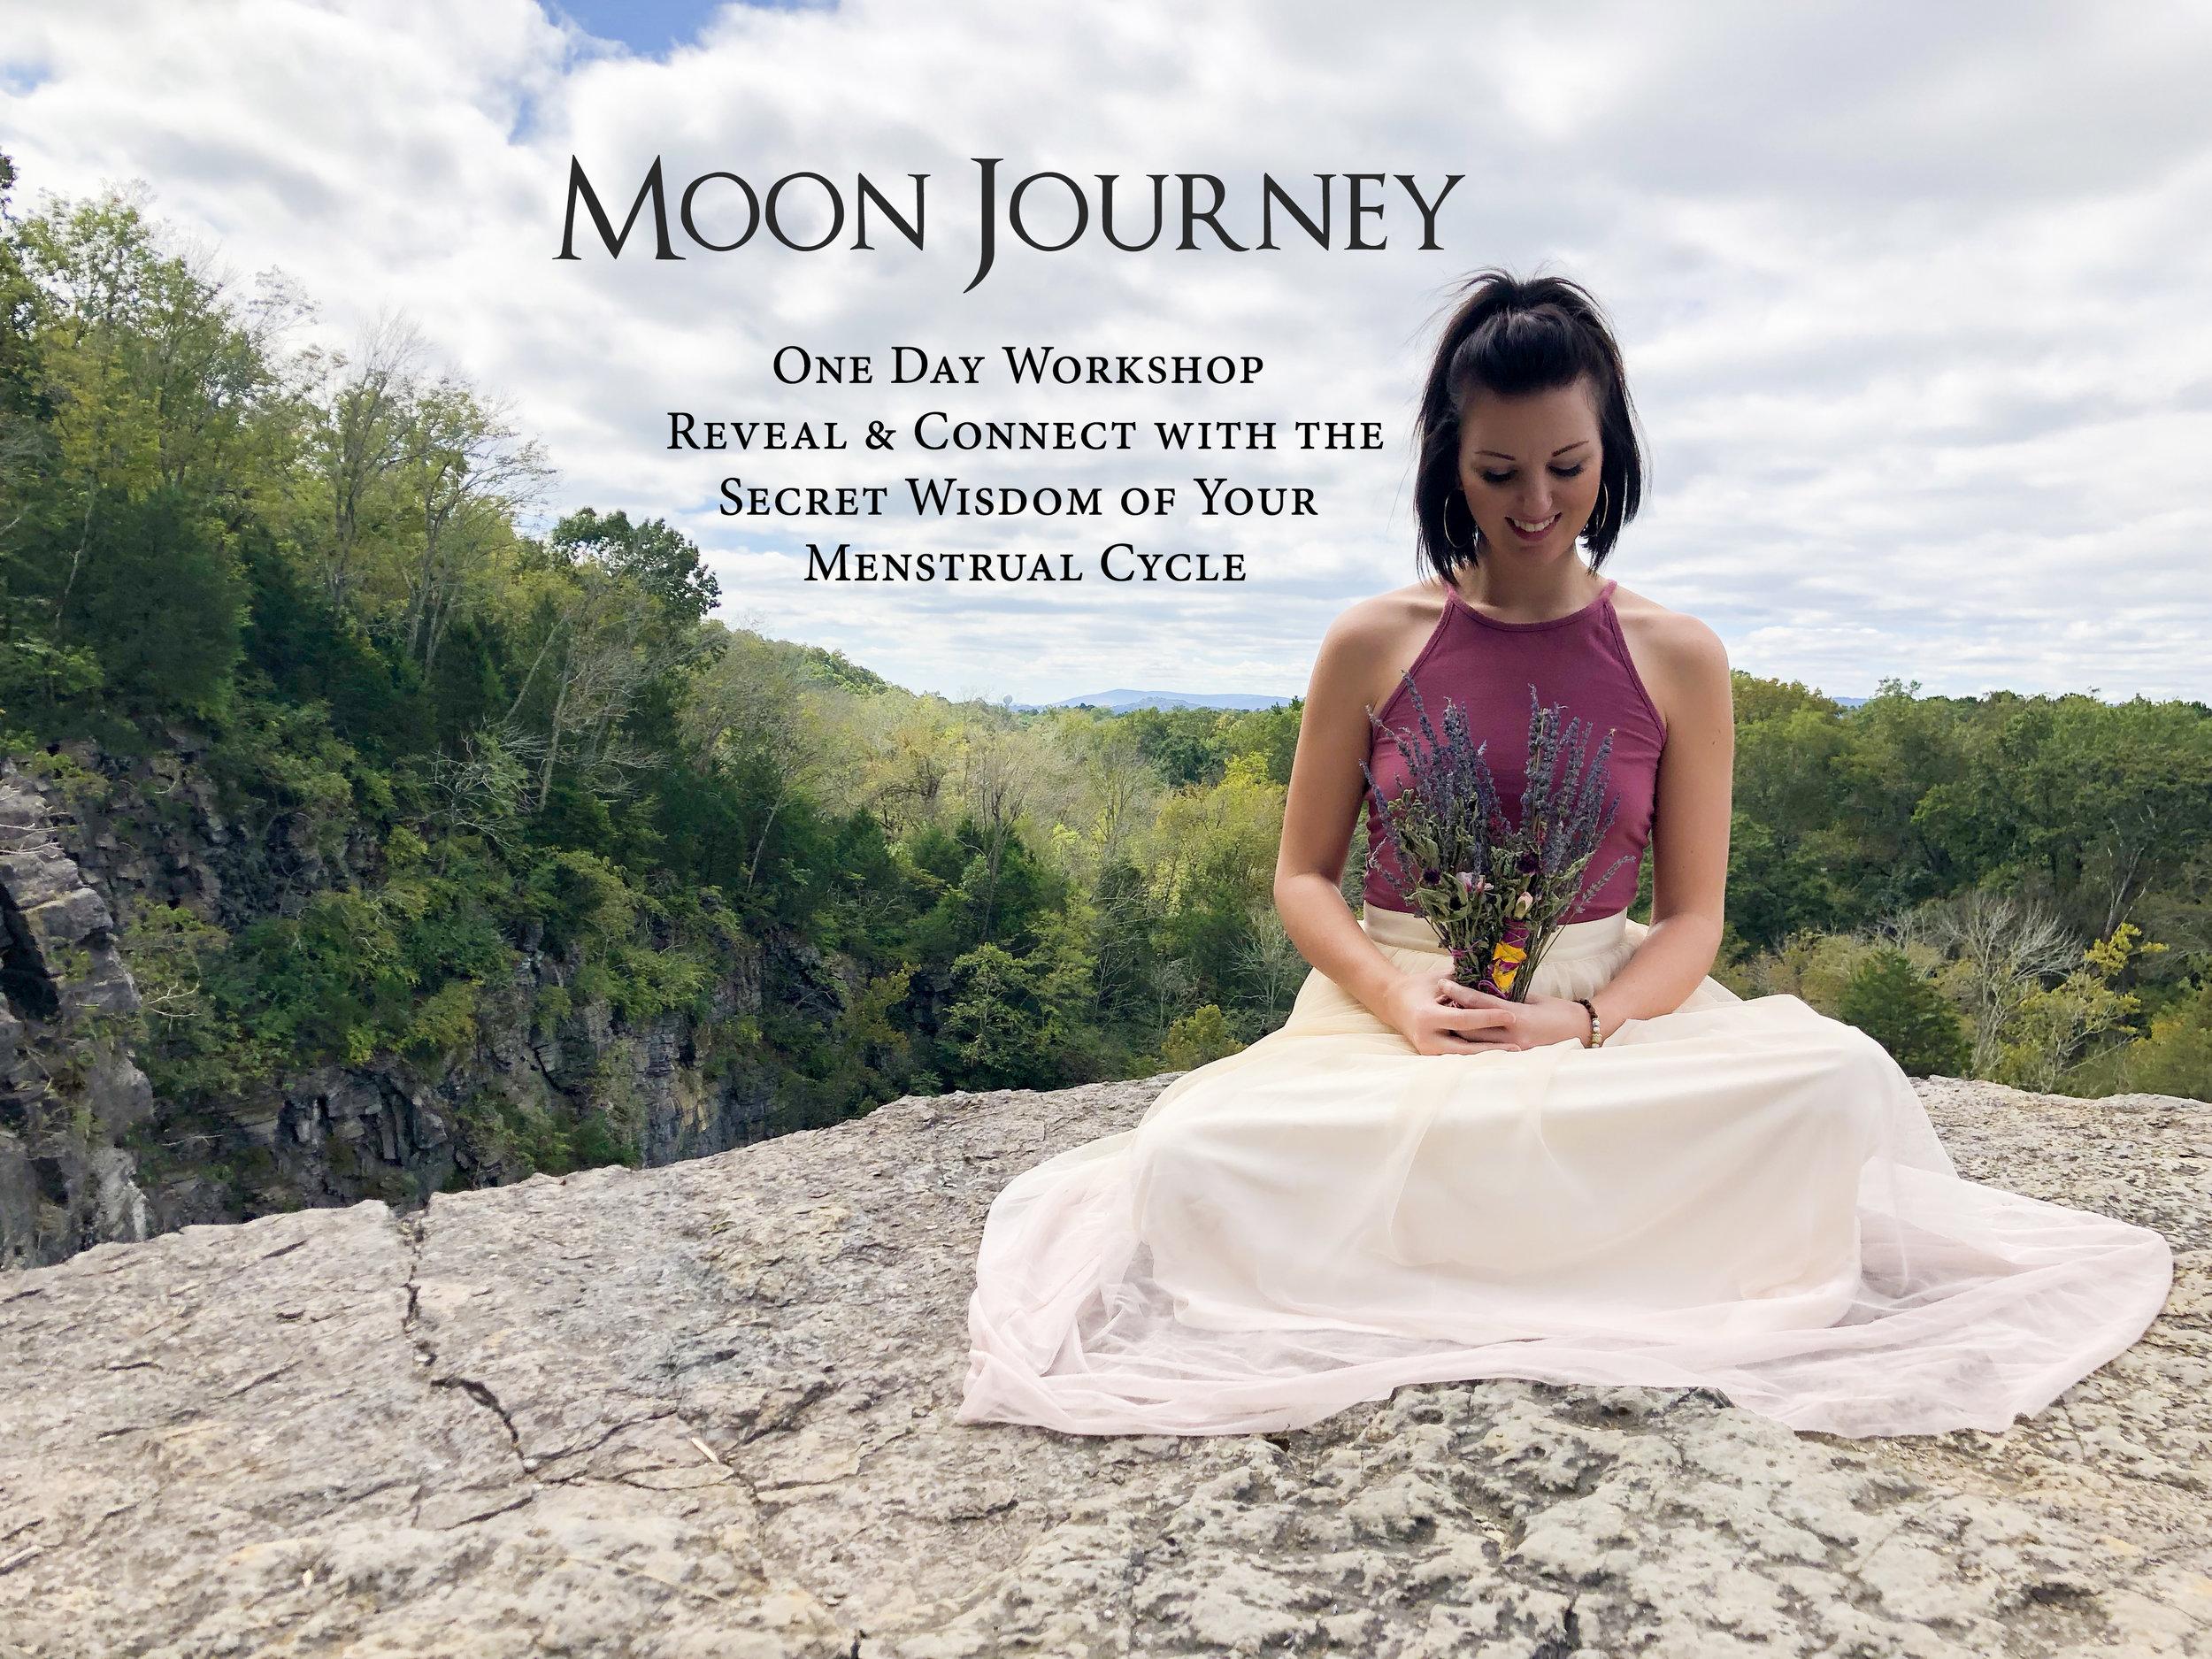 Moon Journey Workshop Redo.jpg